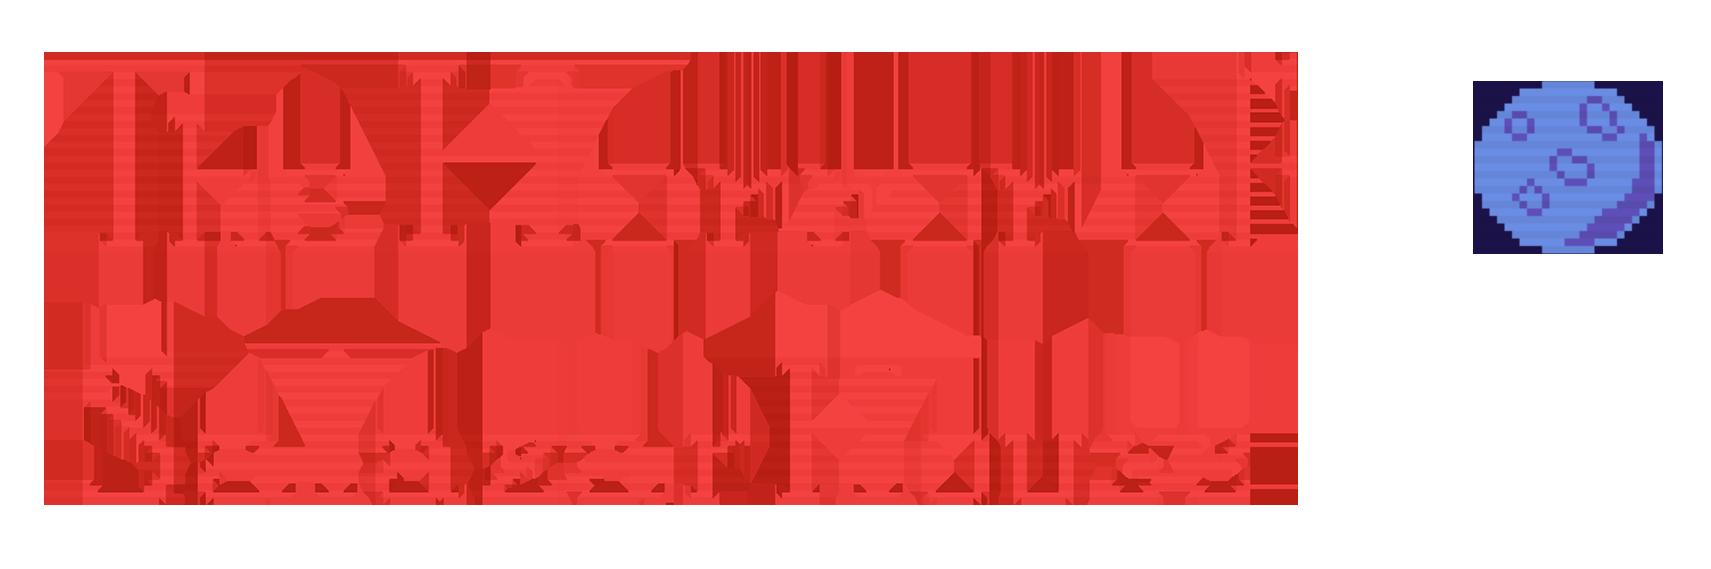 The Horror Of Salazar House